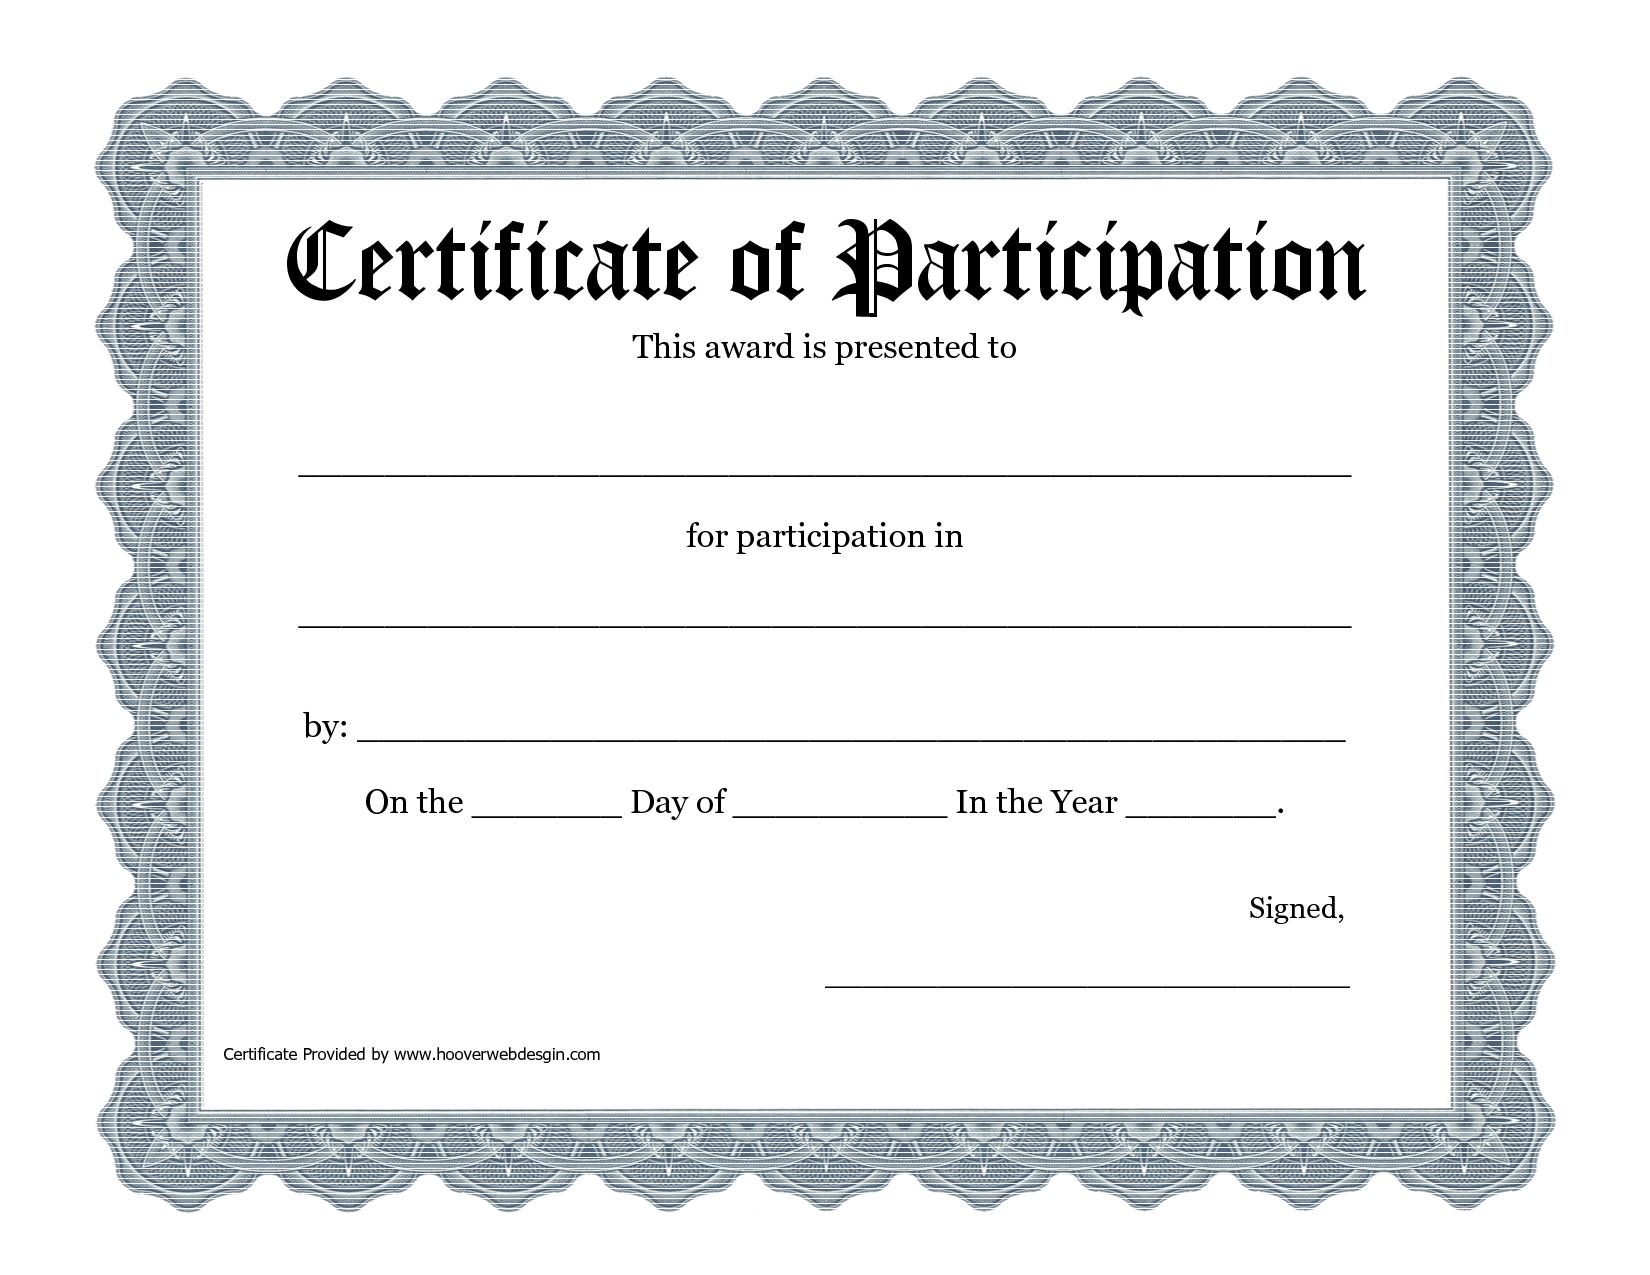 Free Printable Award Certificate Template - Bing Images | 2016 Art - Free Printable Award Certificates